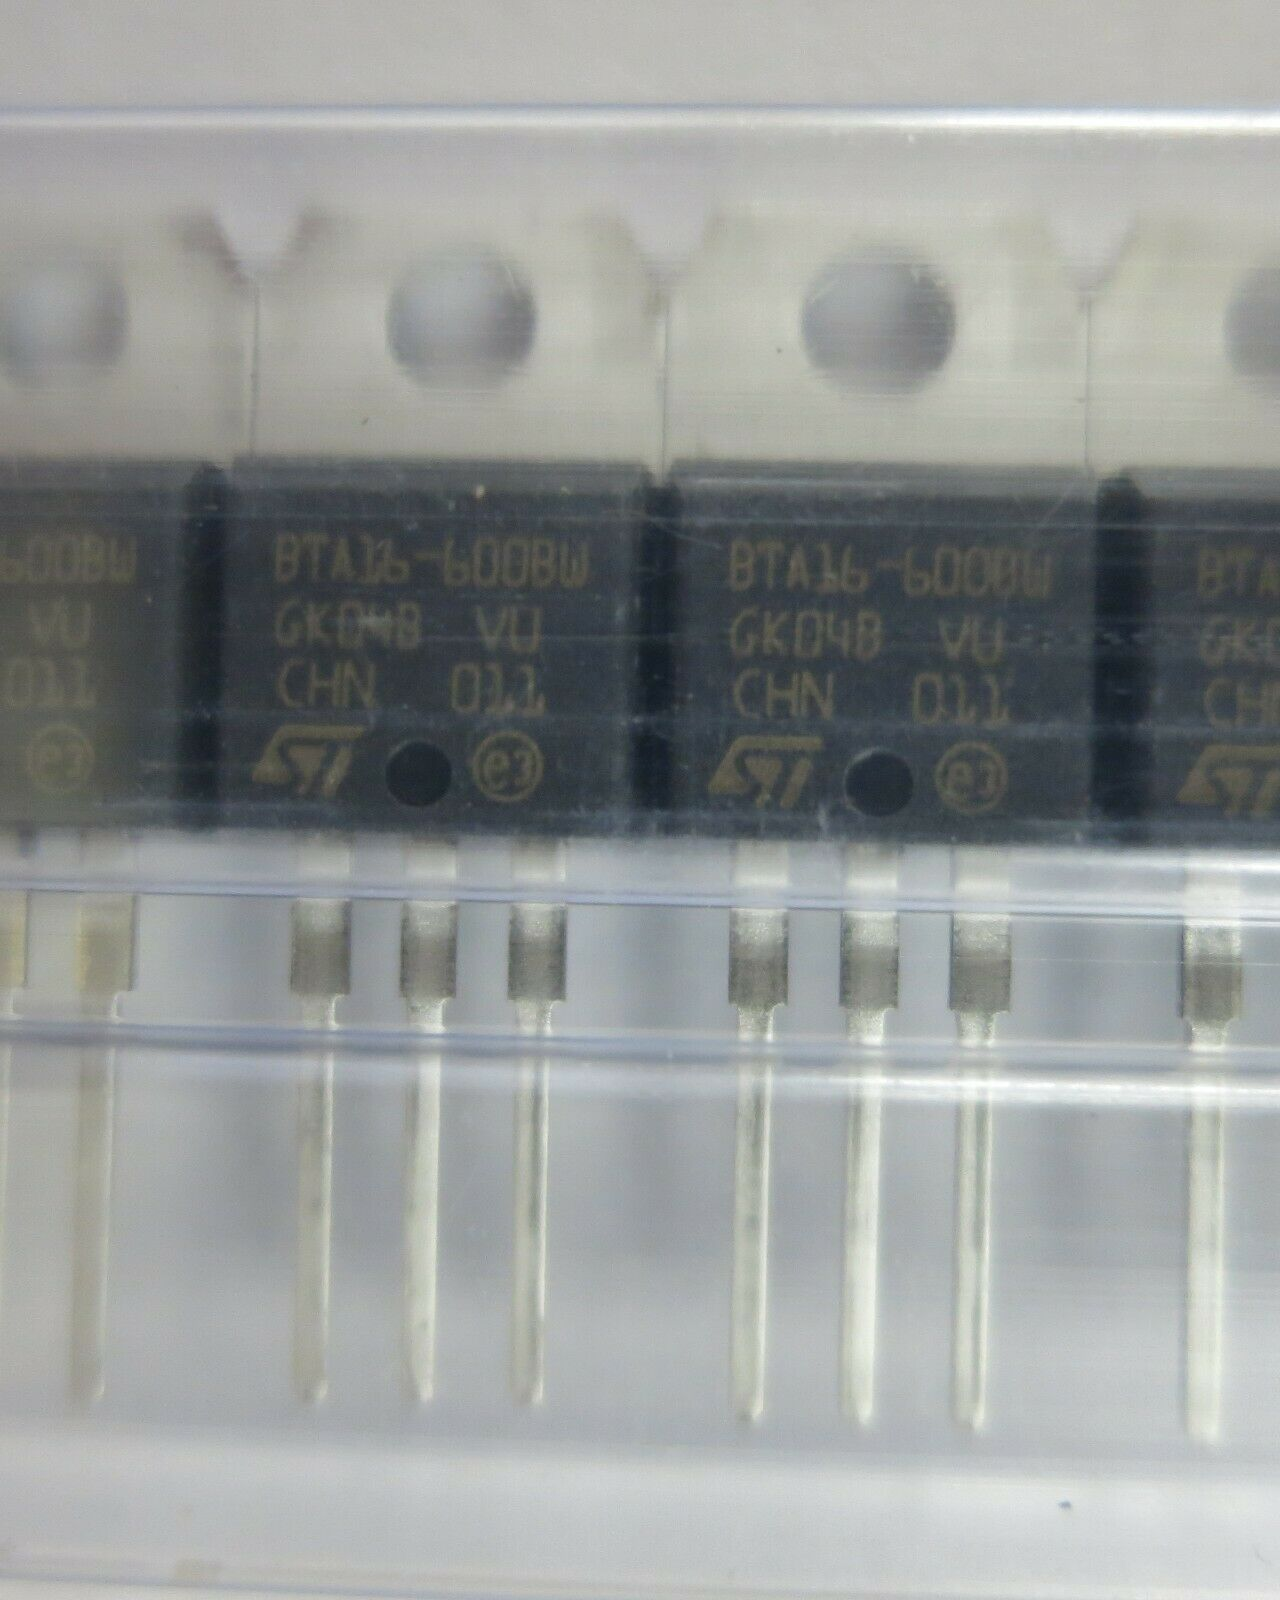 bta06-600sw STM Triac 6 A 600 V 10 ma to220ab New 2 pc